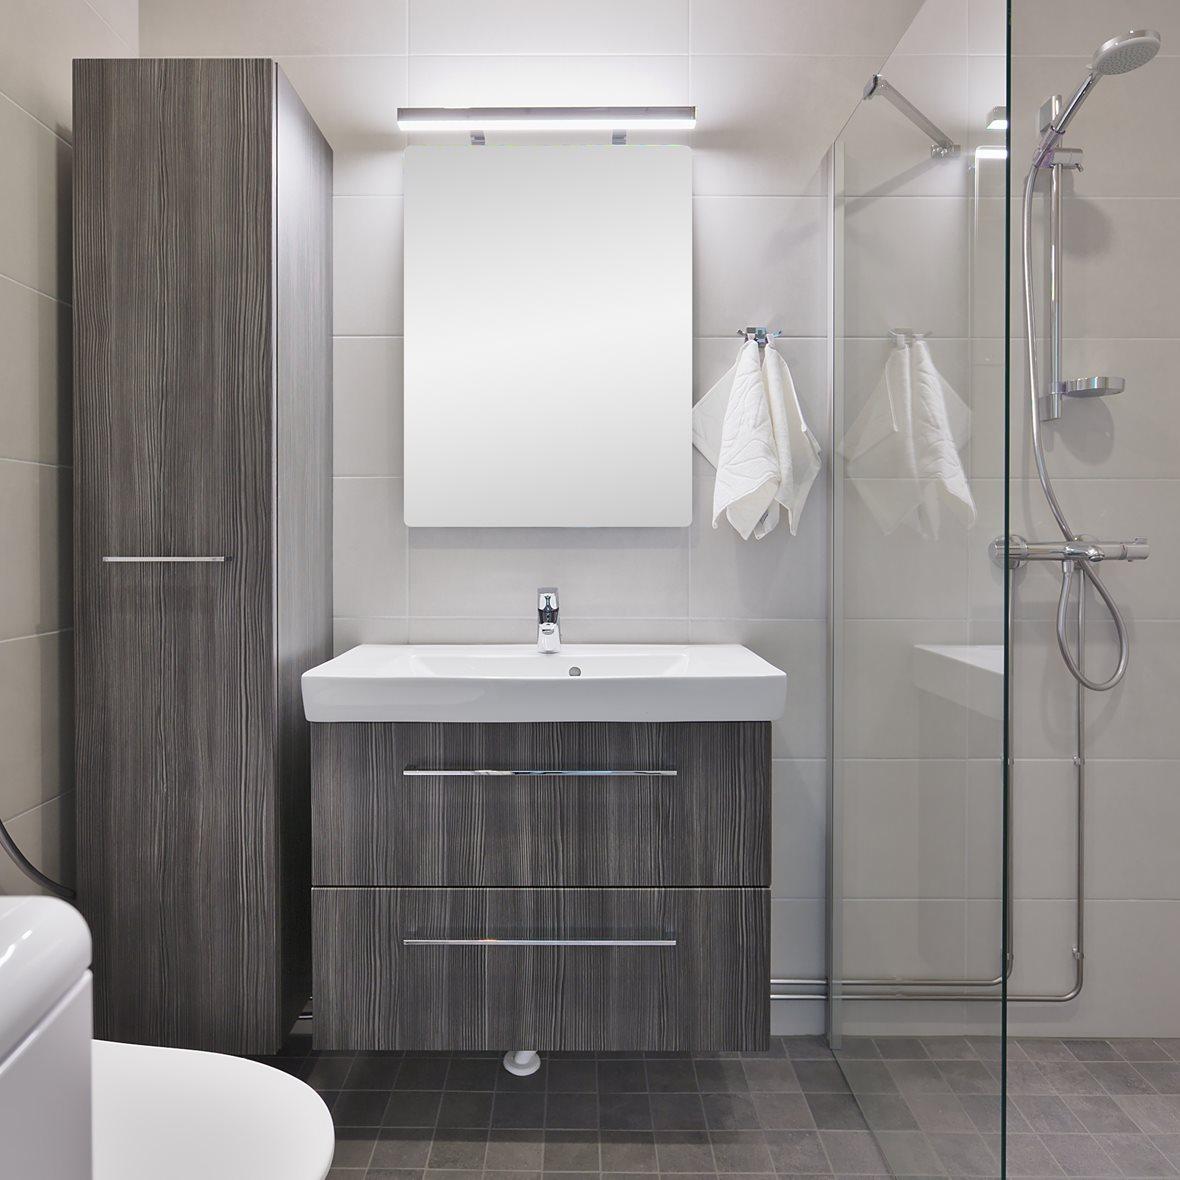 Kylpyhuone Maali